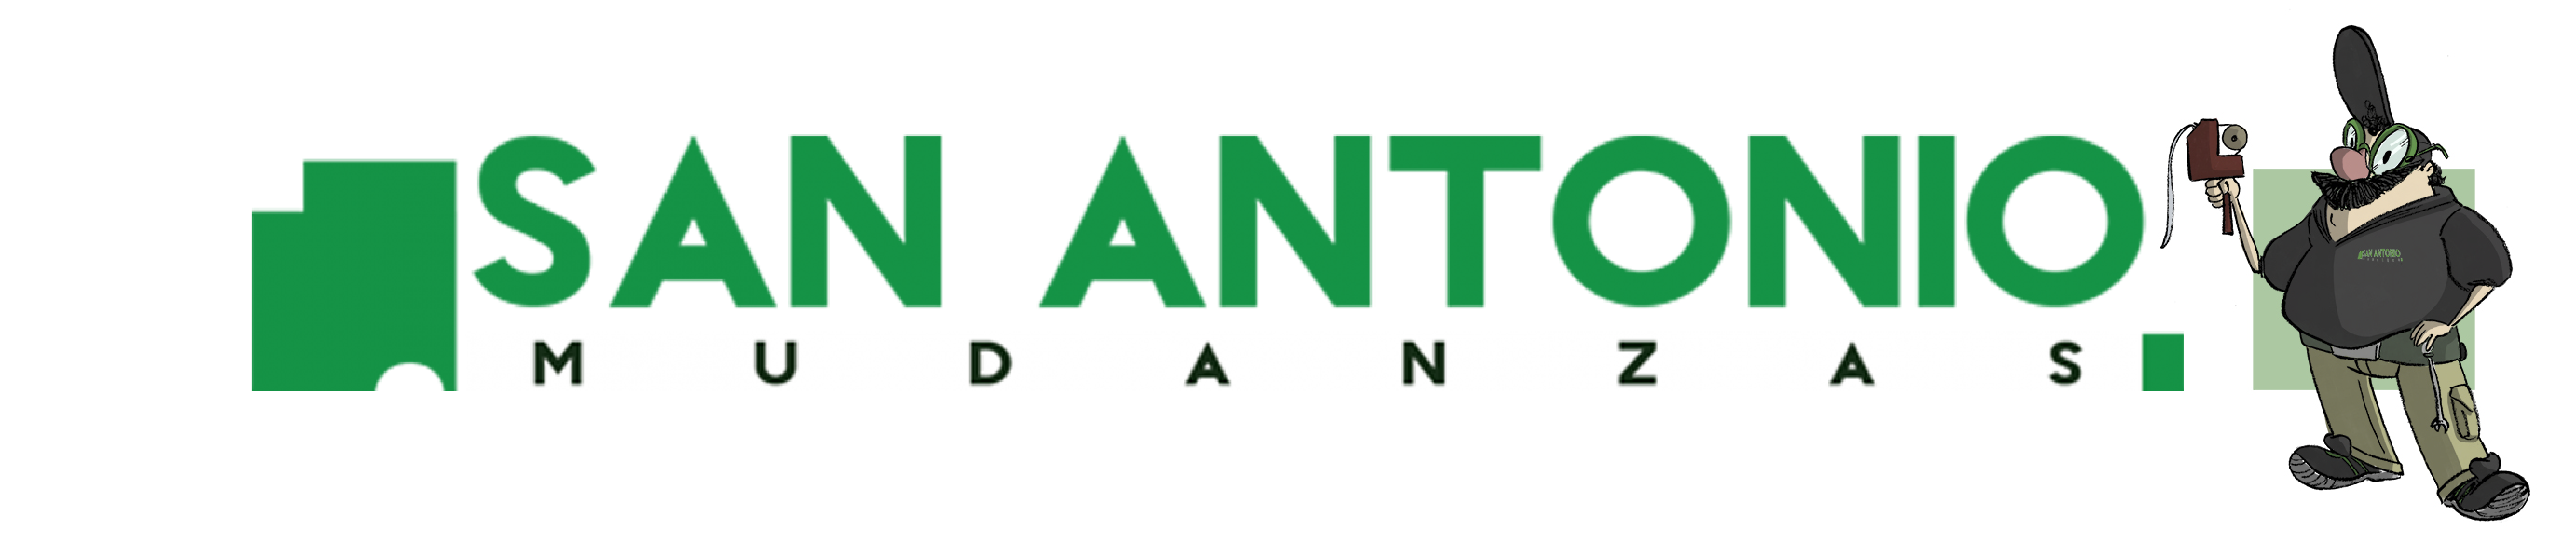 San Antonio Mudanzas